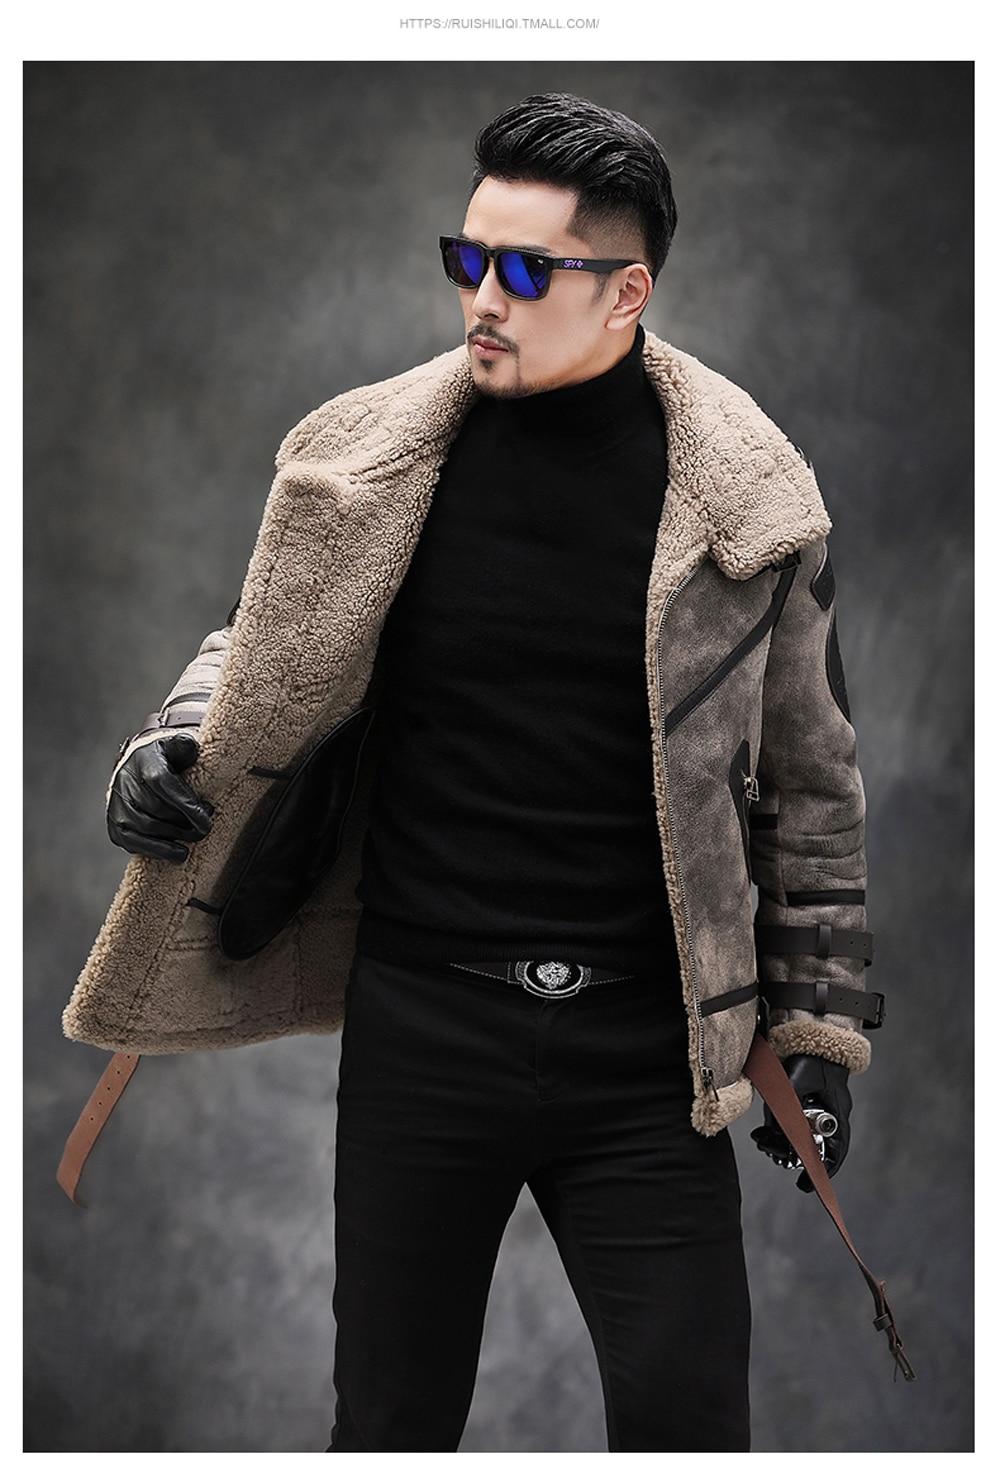 H05c89af5944a44459d2baca35b8db50fQ 2019 Fashion 100% Quality Real Sheepskin Fur Men Coat Genuine Full Pelt Sheep Shearling Male Winter Jacket Brown Men Fur Outwear